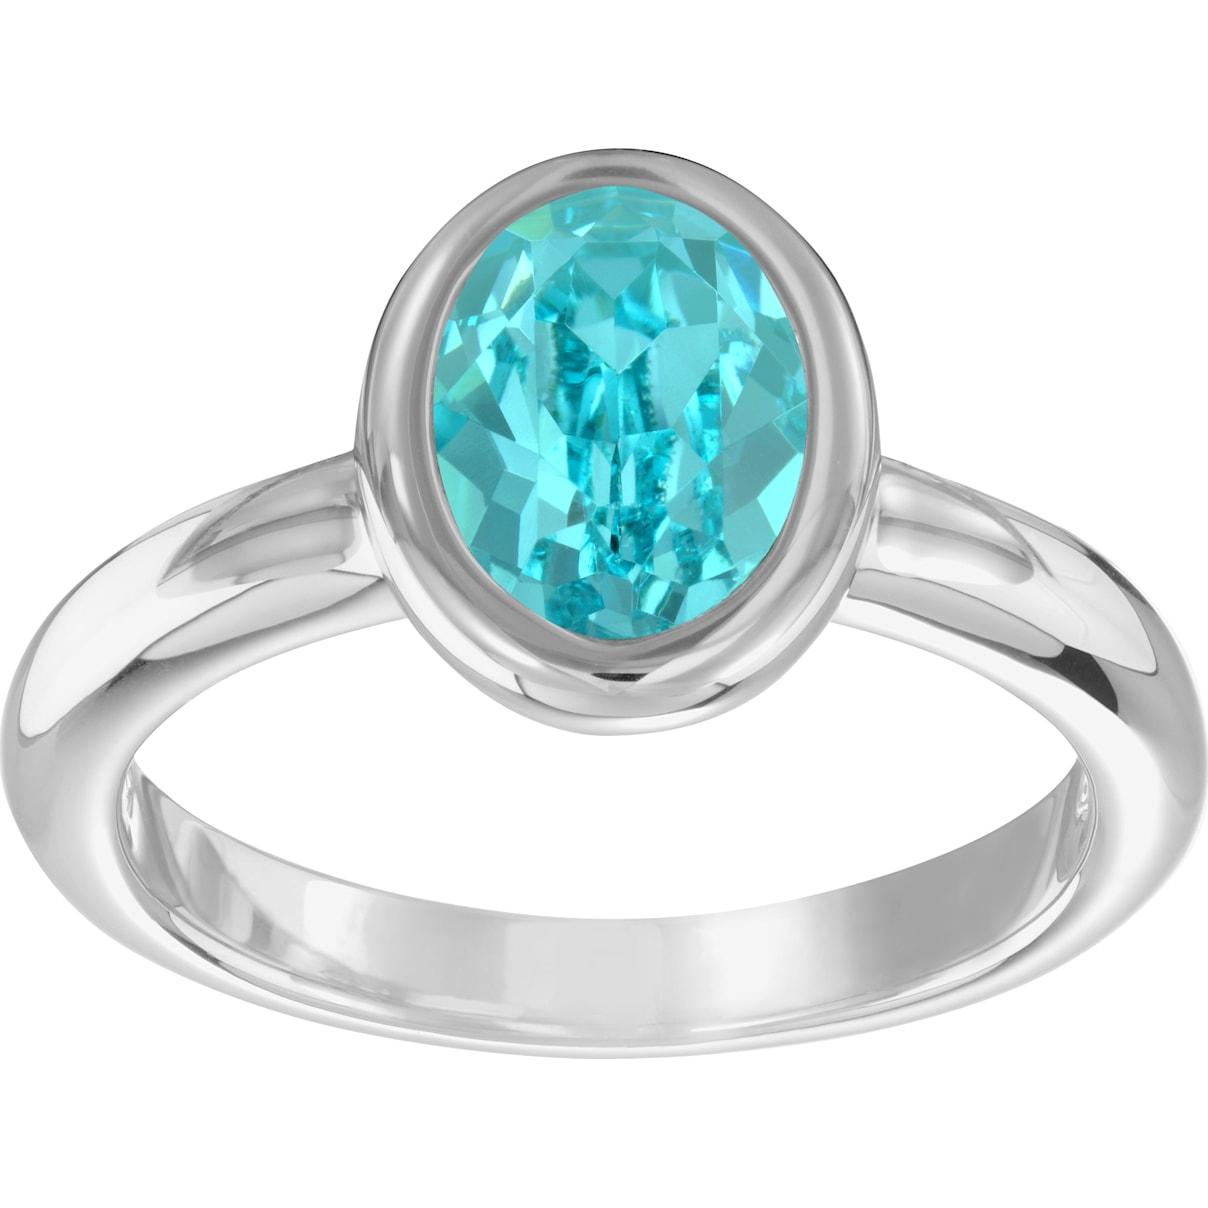 Swarovski Laser Ring